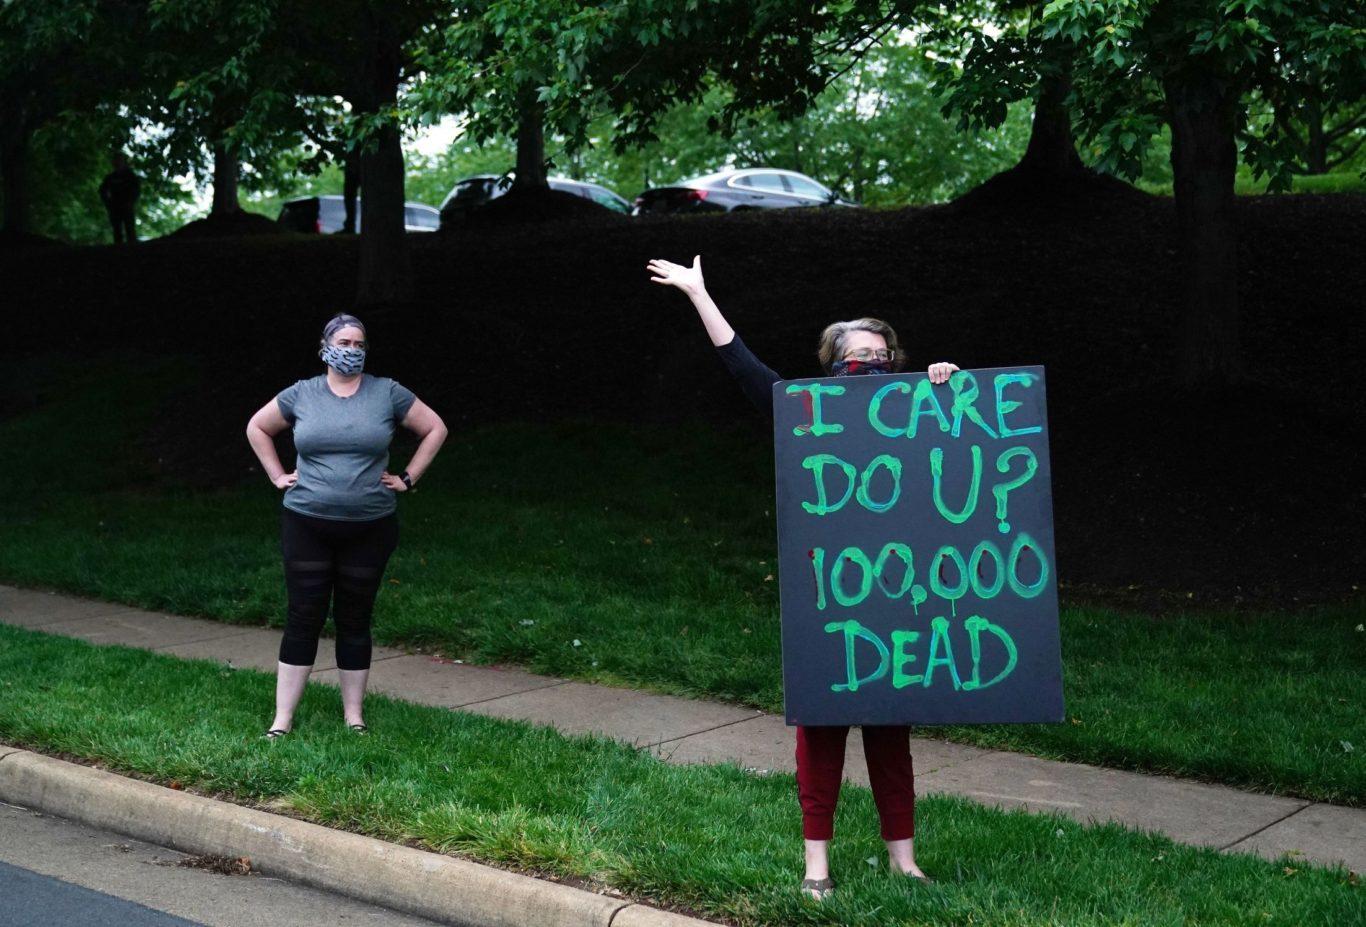 Trump is ignoring the 100k deaths in america